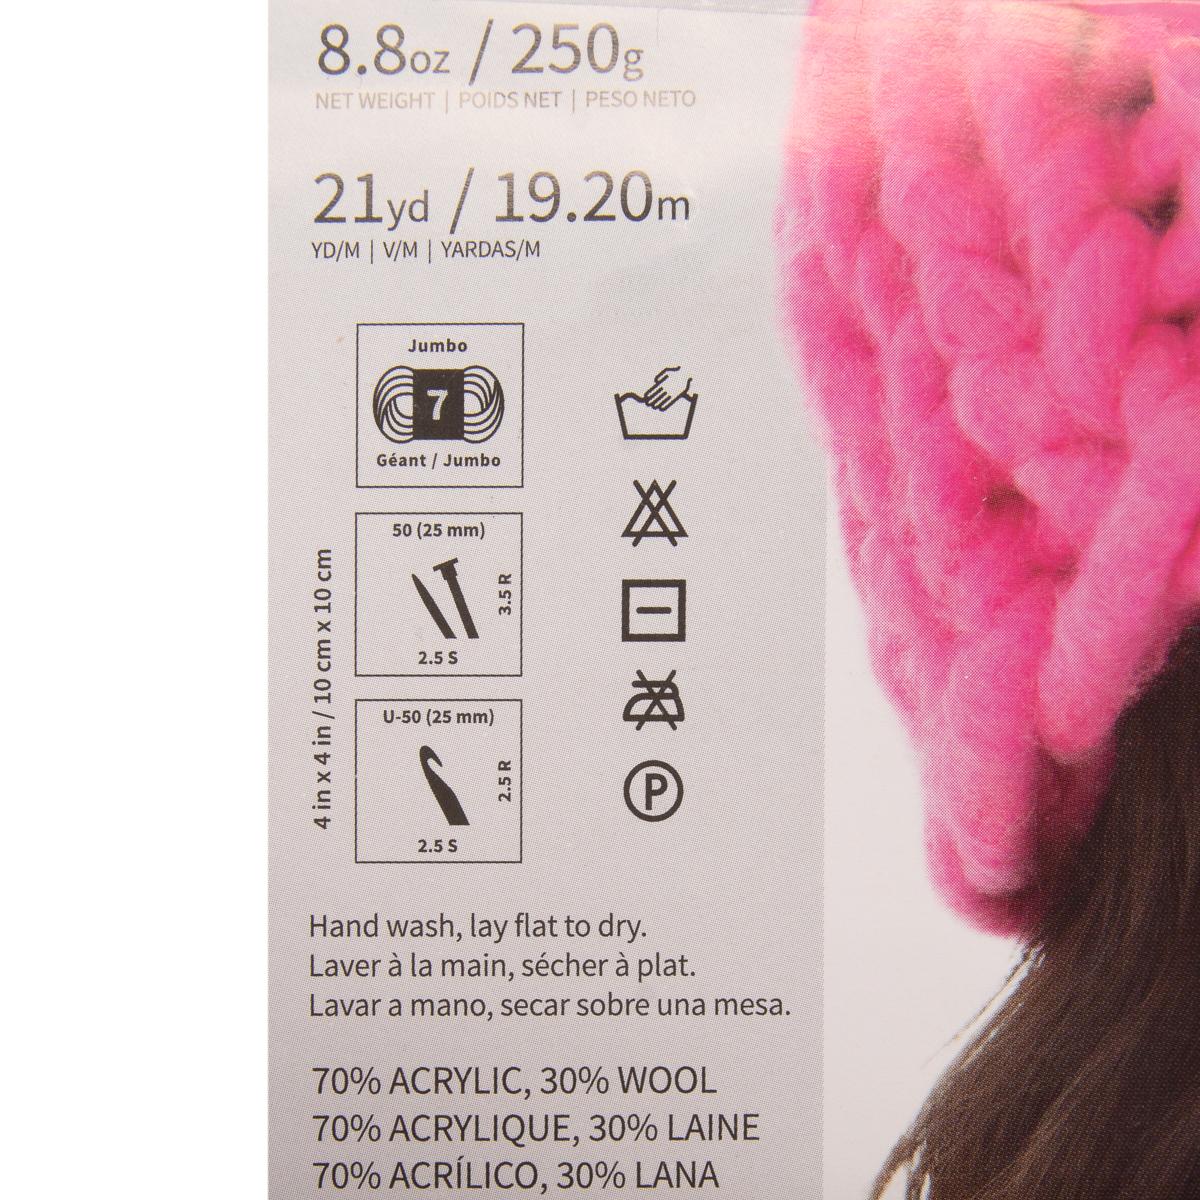 3pk-Lion-Brand-Wow-Acrylic-amp-Wool-yarn-Jumbo-7-Knitting-Crocheting-Skeins-Soft thumbnail 14